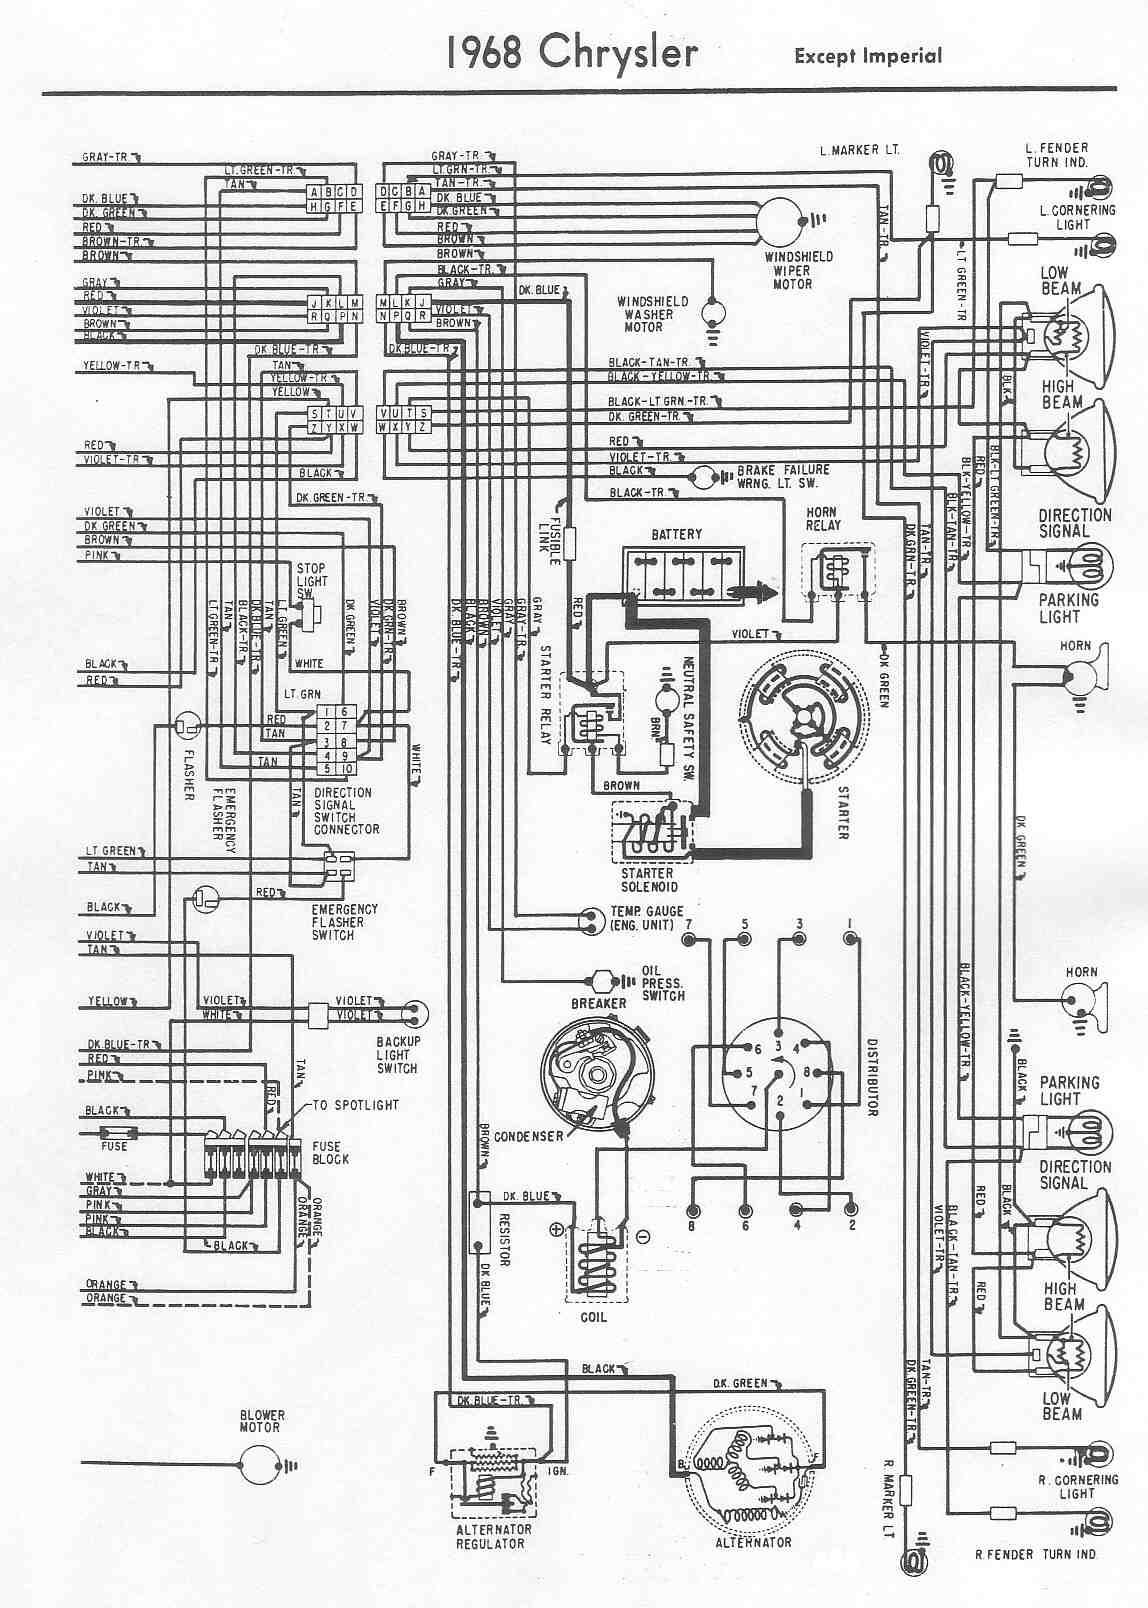 mopar wiring diagrams nice place to get wiring diagram u2022 mopar horn wiring mopar ecu wiring [ 1148 x 1608 Pixel ]